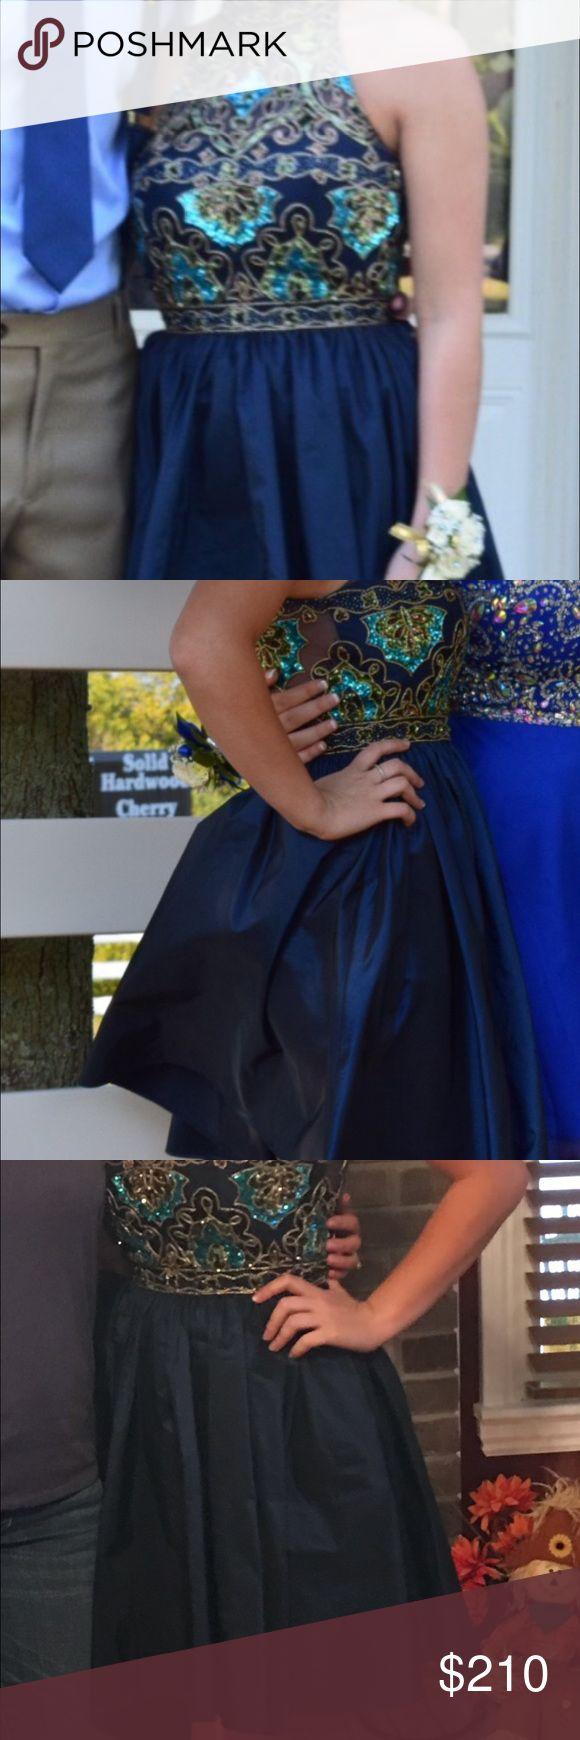 Sherri Hill Homecoming Dress Size 2. Worn once. No alterations. Sherri Hill Dresses Prom